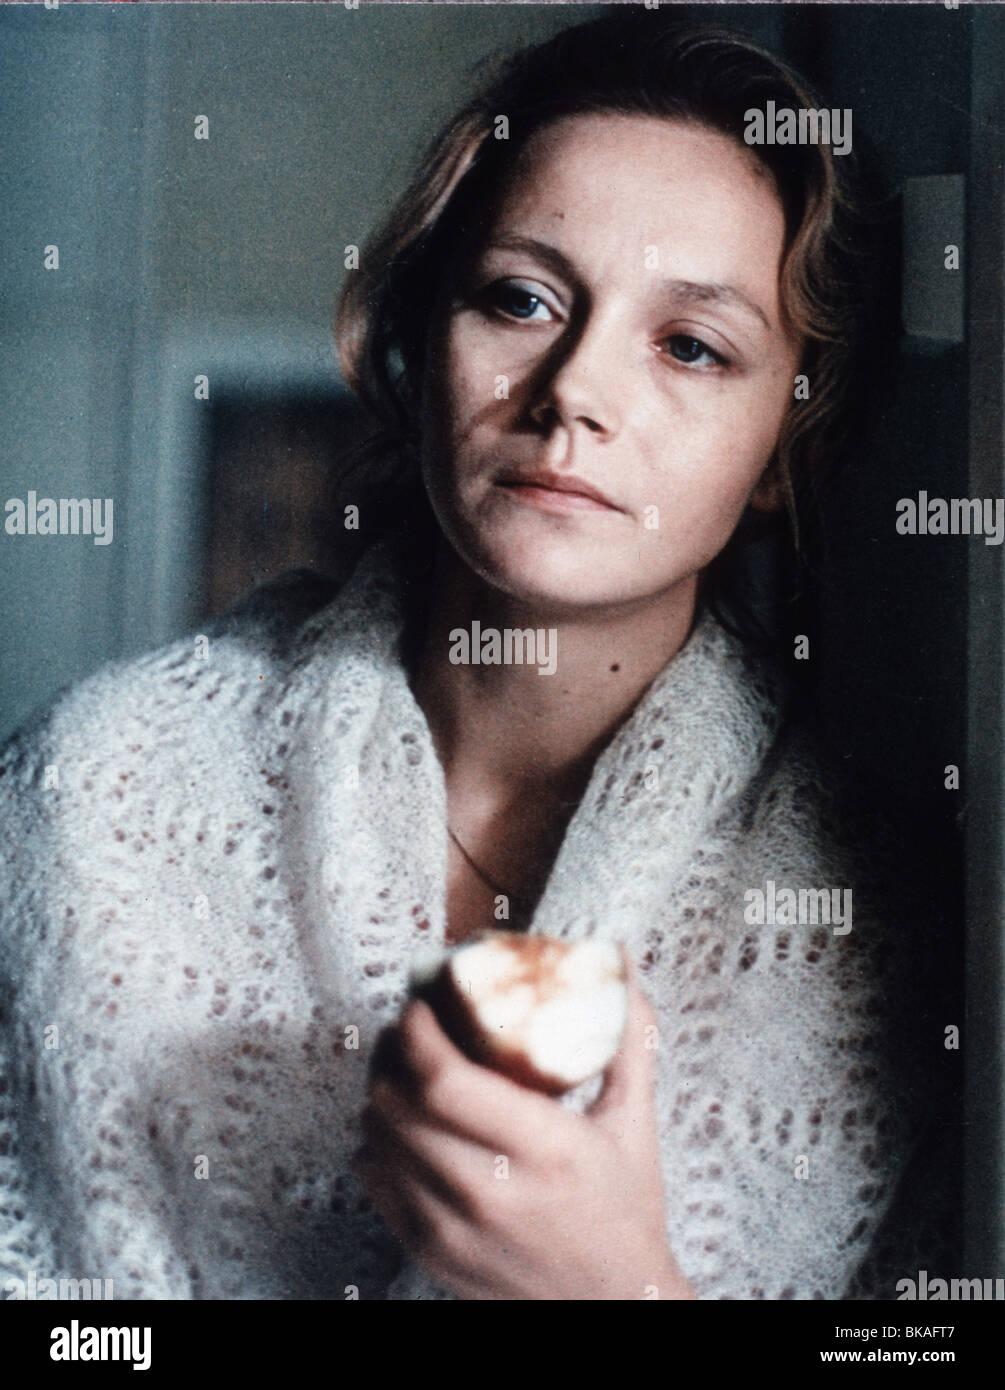 Bez Svideteley ohne Zeugen Jahr: 1983 Sowjetunion Regie: Nikita Michalkow Irina Kupchenko Stockbild